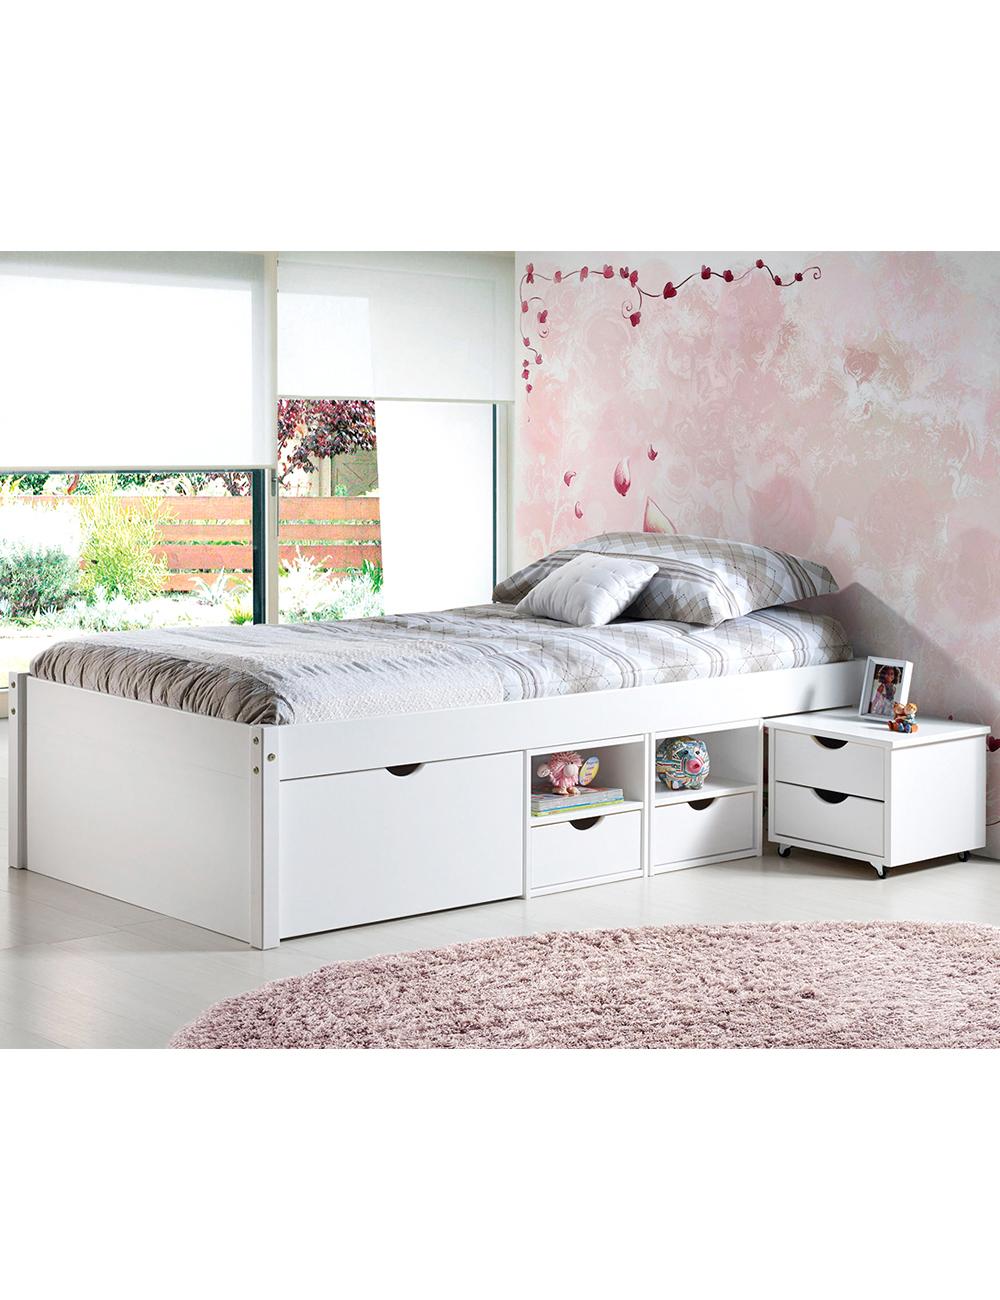 funktionsbett weiss lasiert 90 x 200 cm. Black Bedroom Furniture Sets. Home Design Ideas